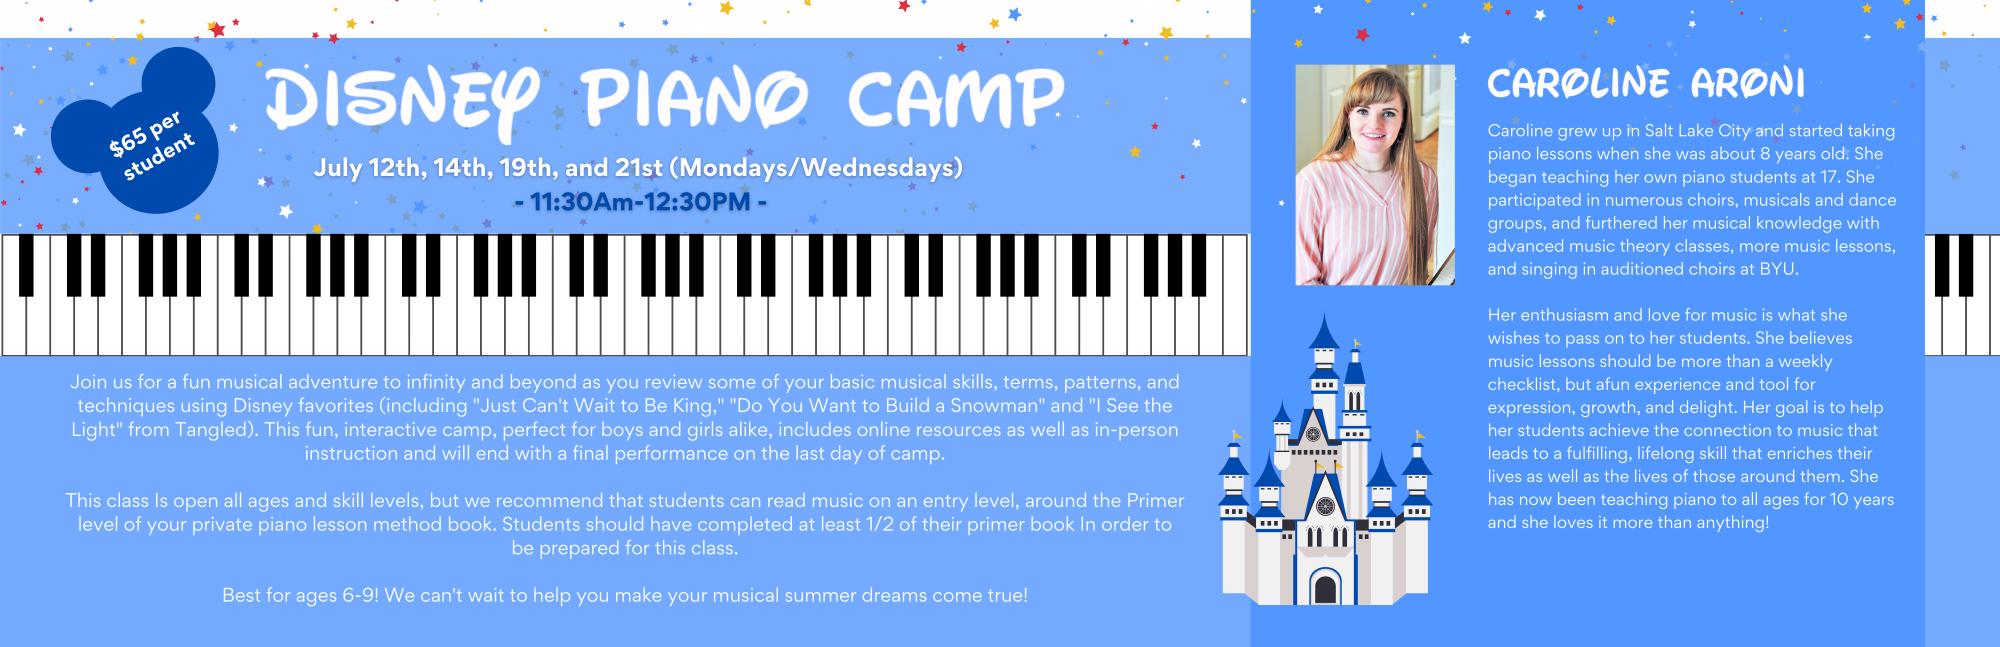 Disney Piano Camp